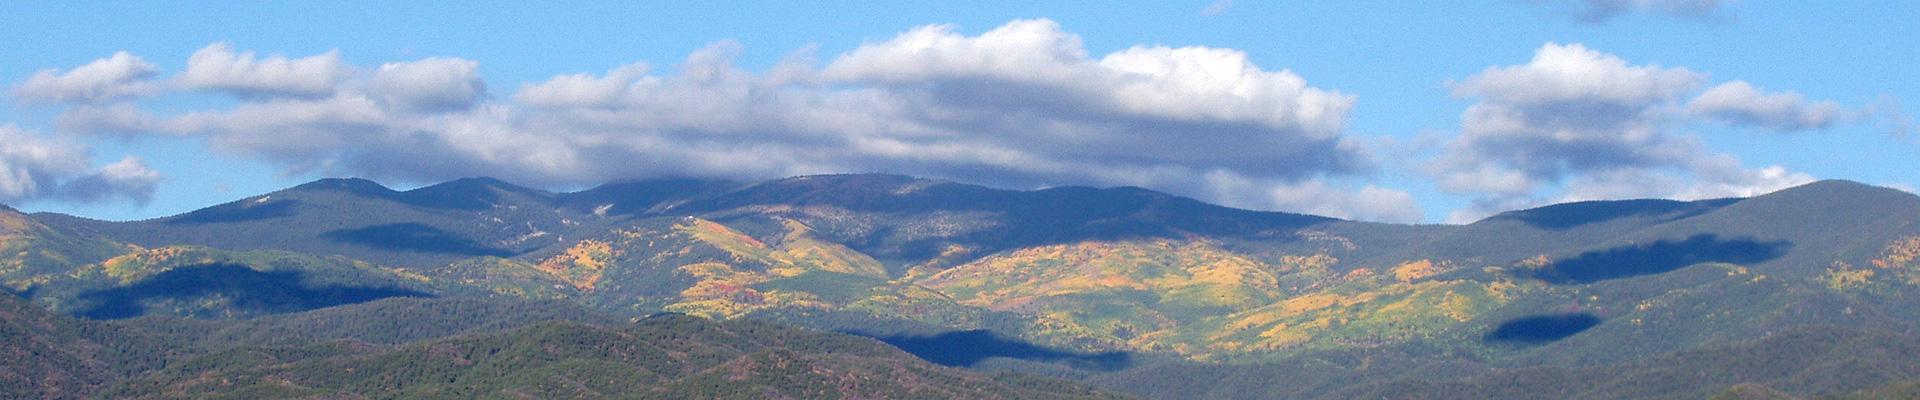 Monte Sereno - Santa Fe NM